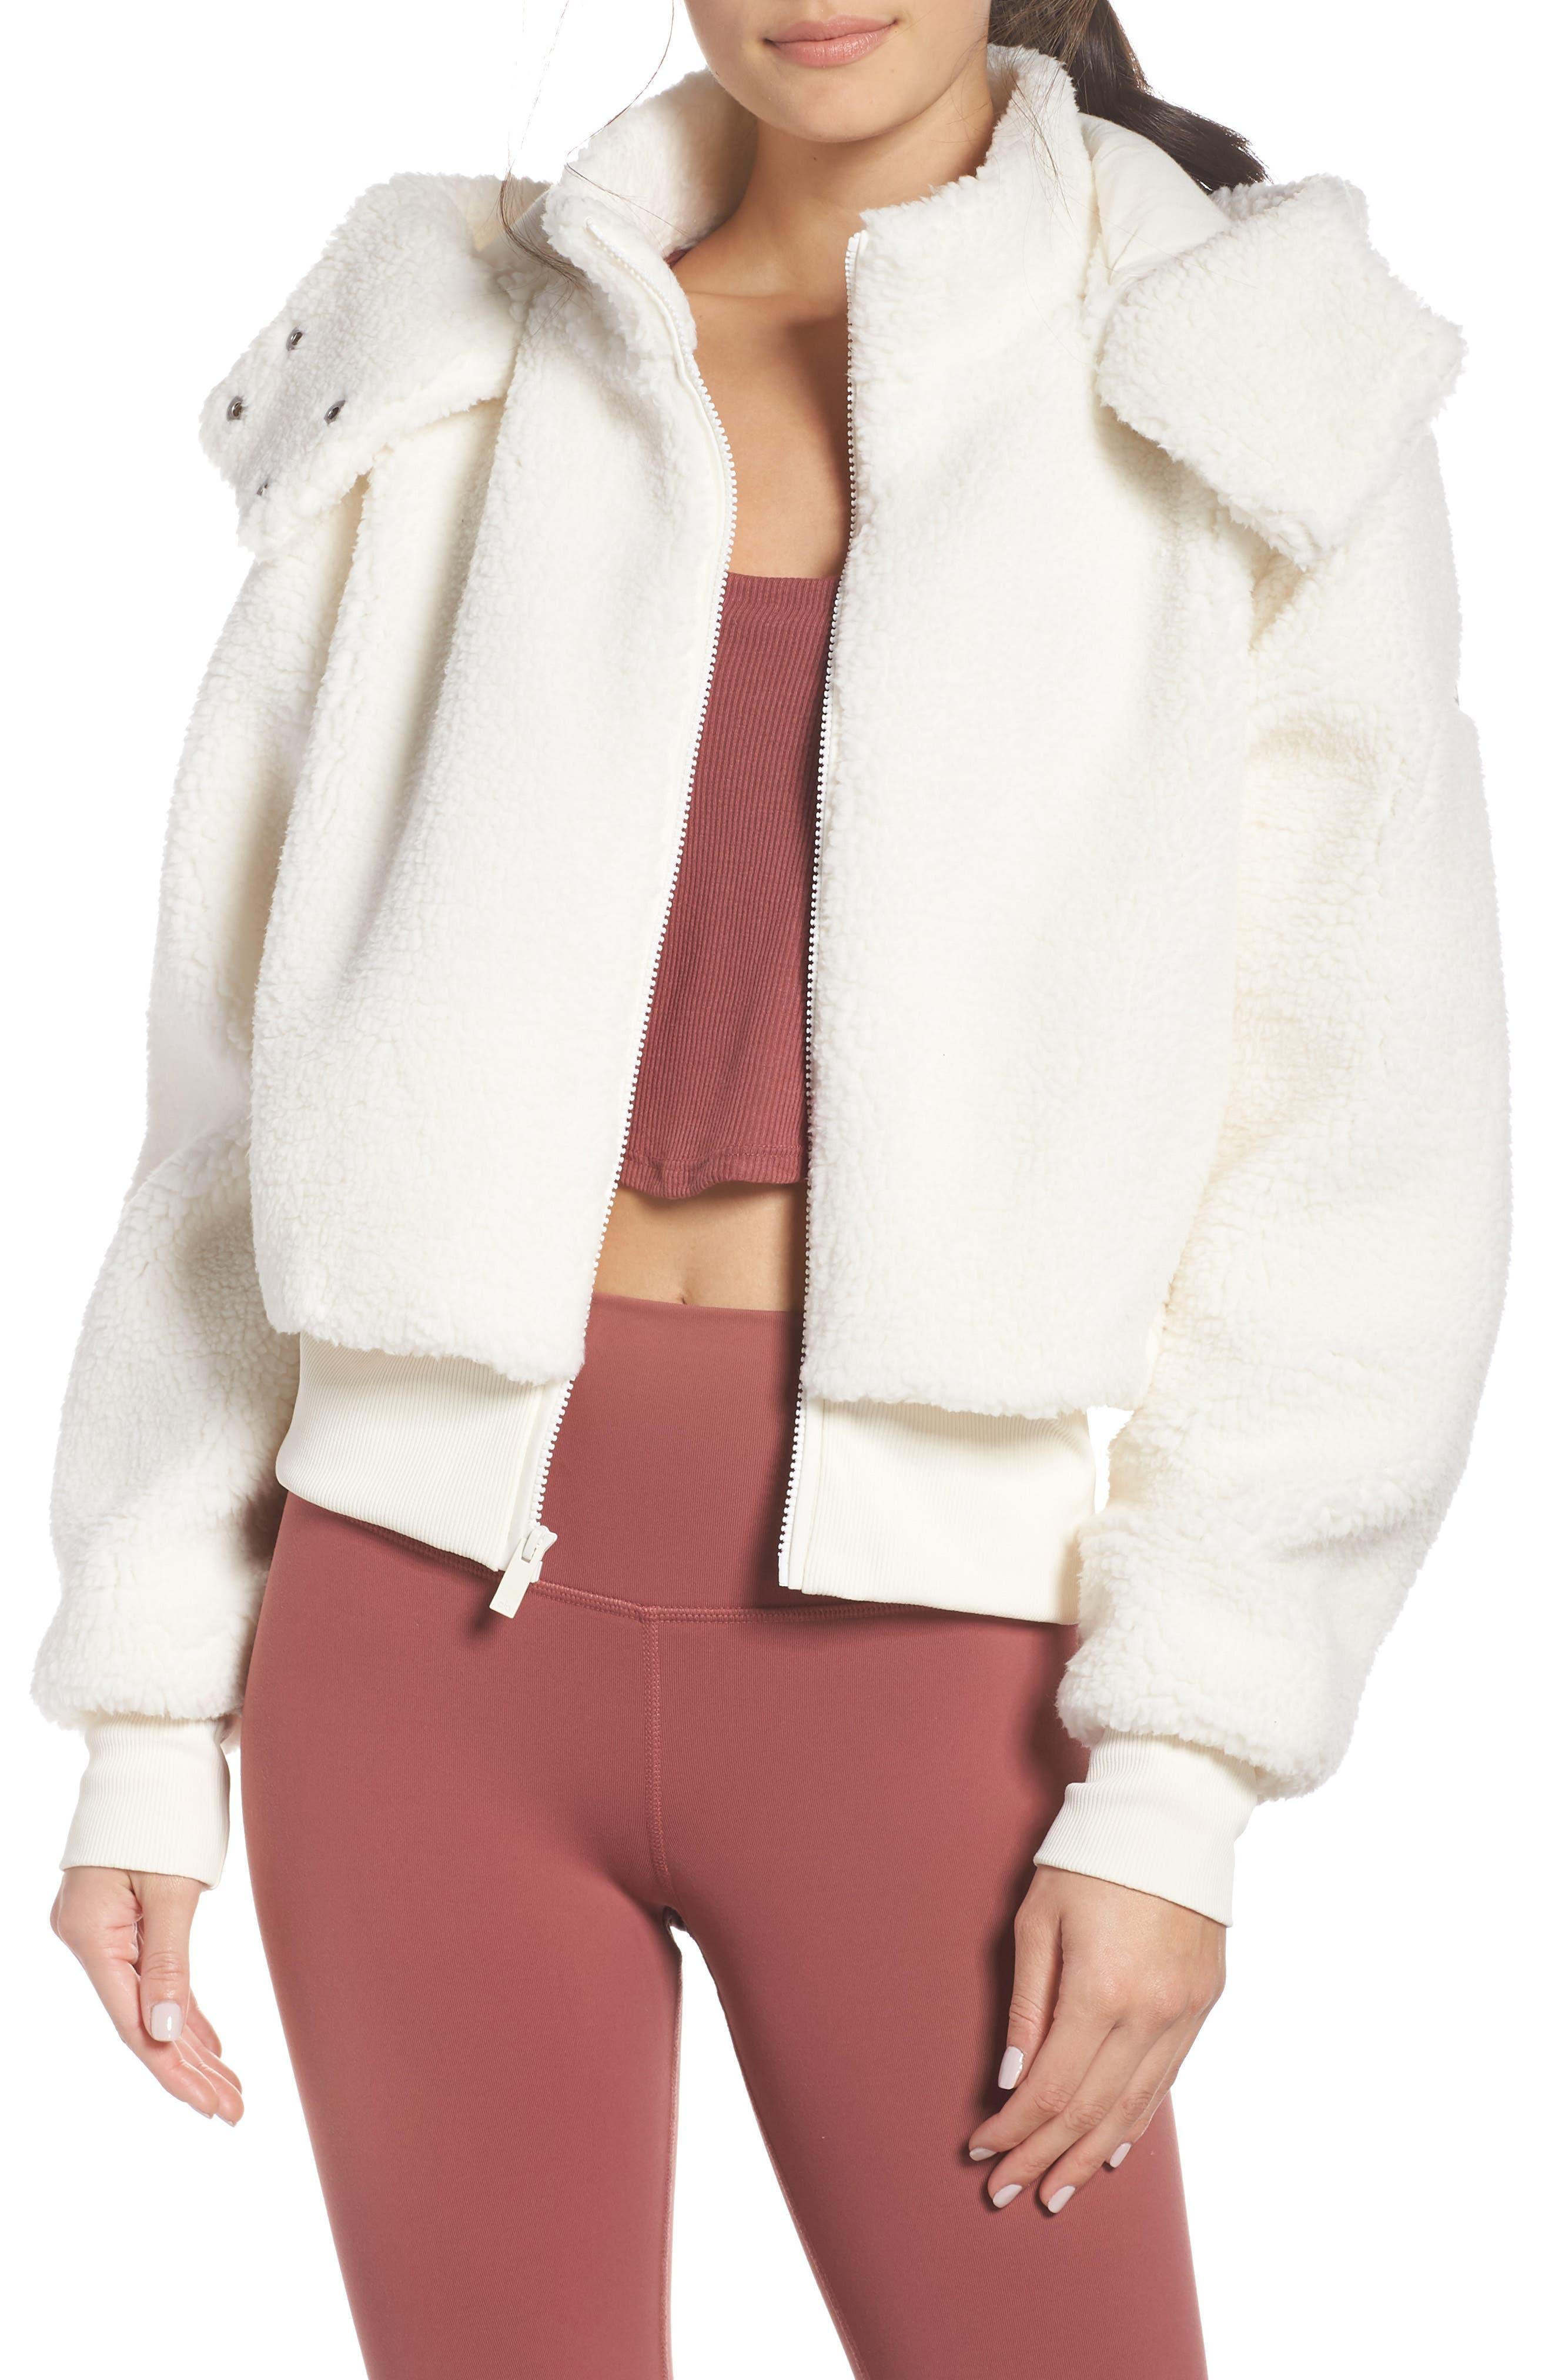 ALO, Foxy Faux Fur Jacket, Main thumbnail 1, color, PRISTINE